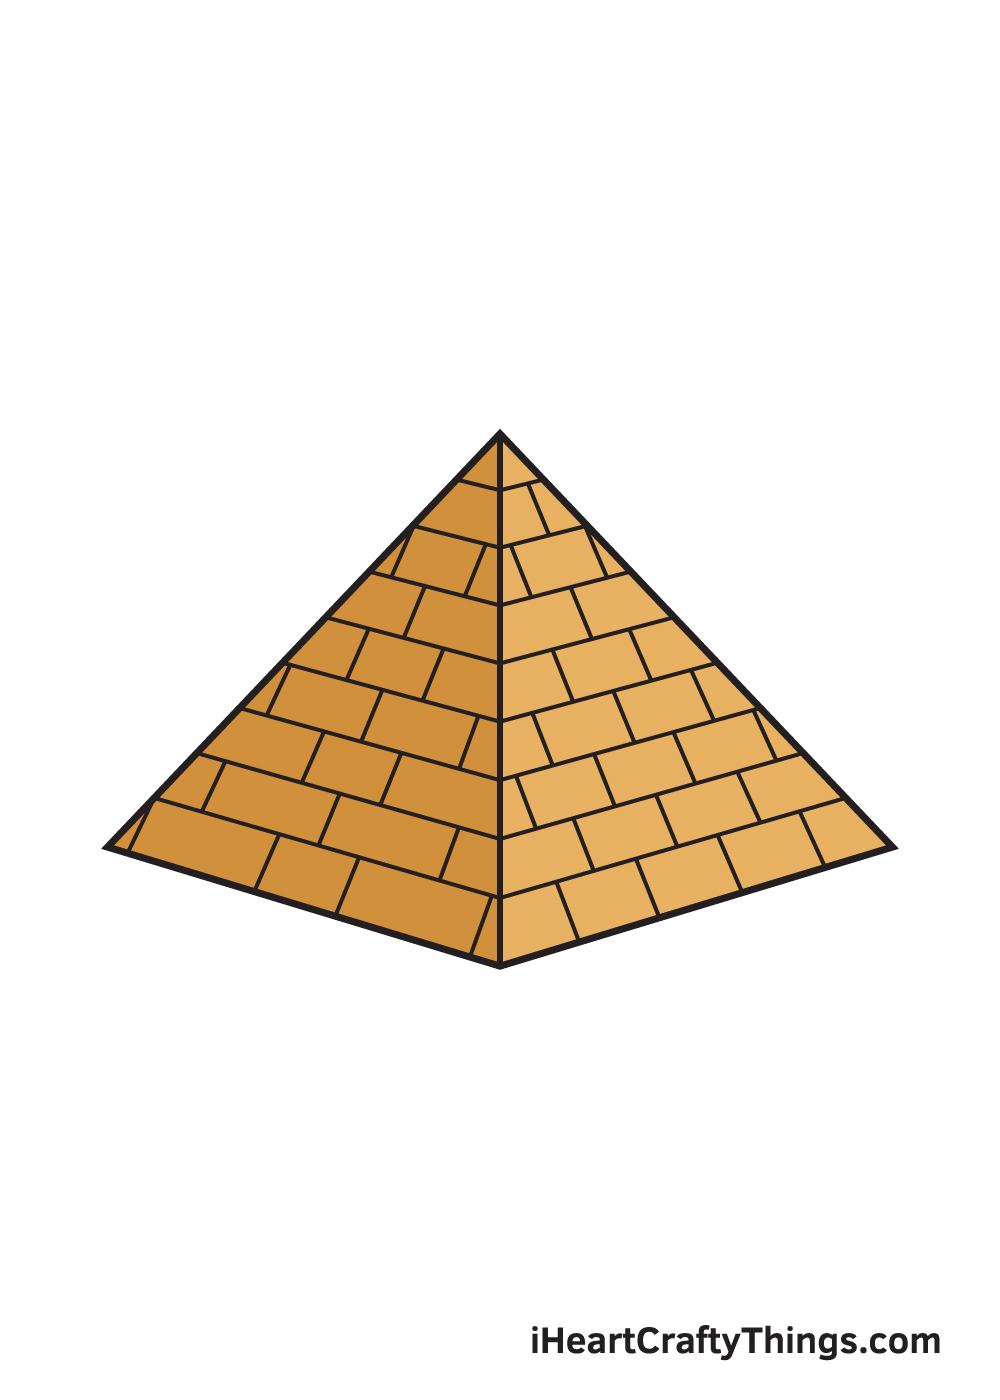 pyramid drawing 9 steps